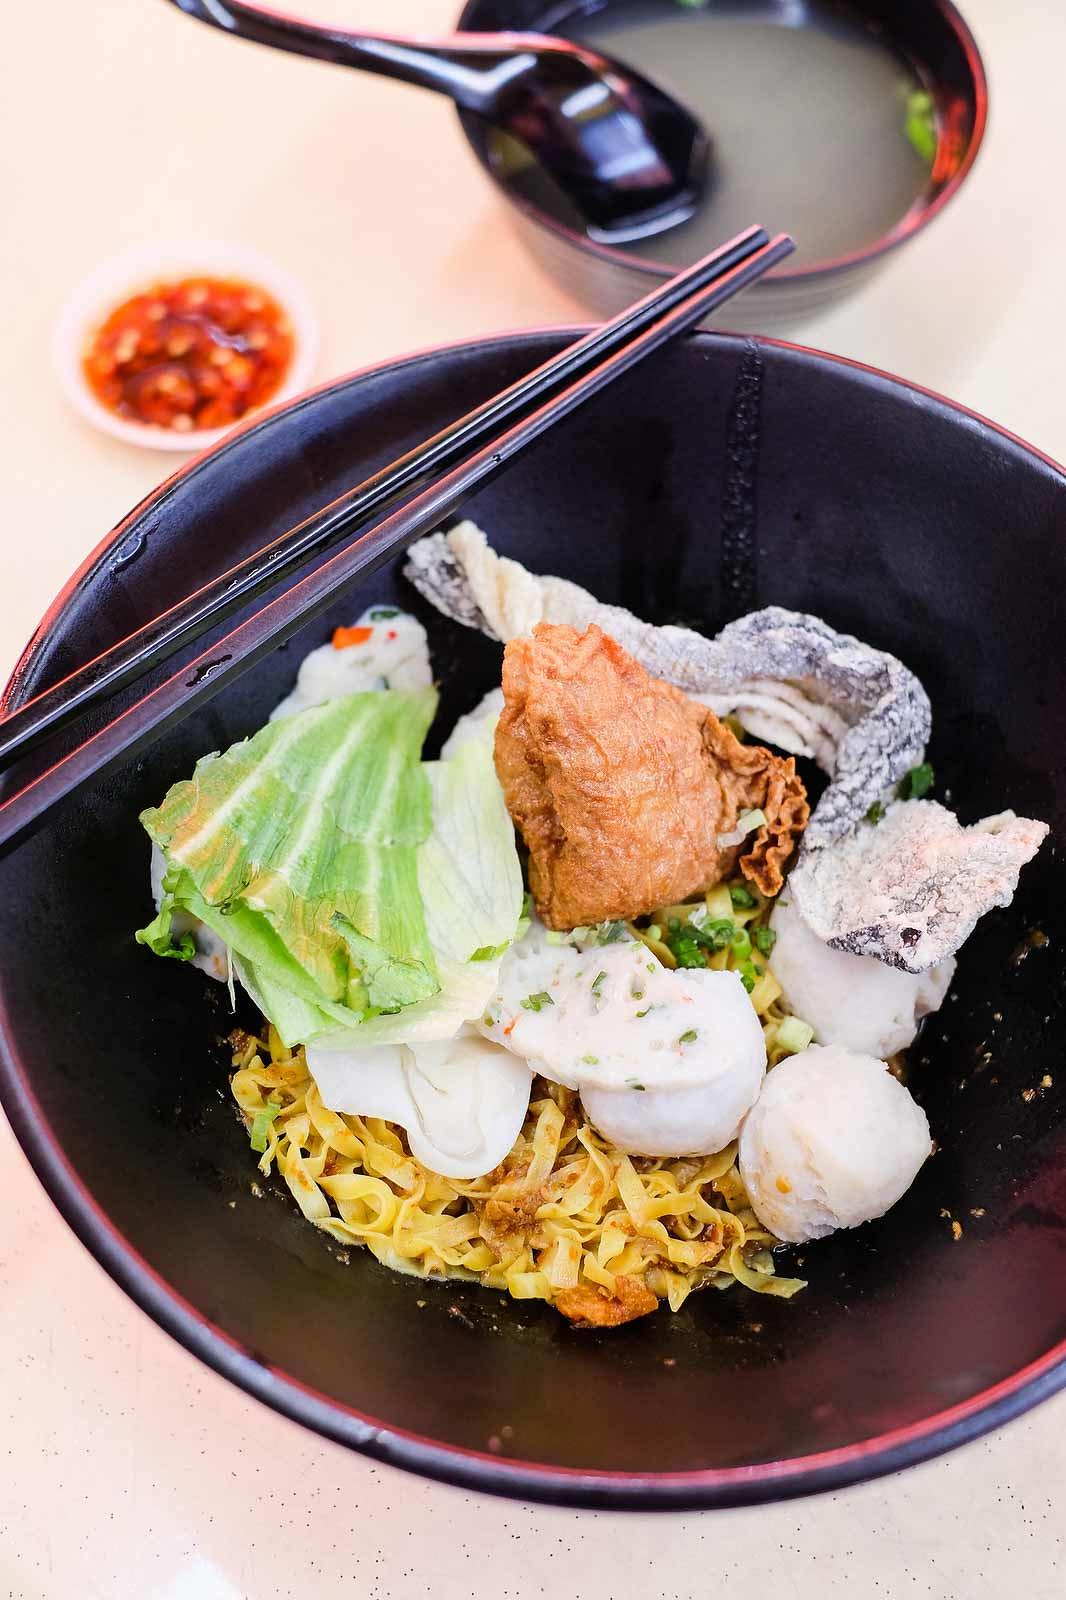 Yishun Park Hawker Centre: Fishball Story - Fishball Noodle